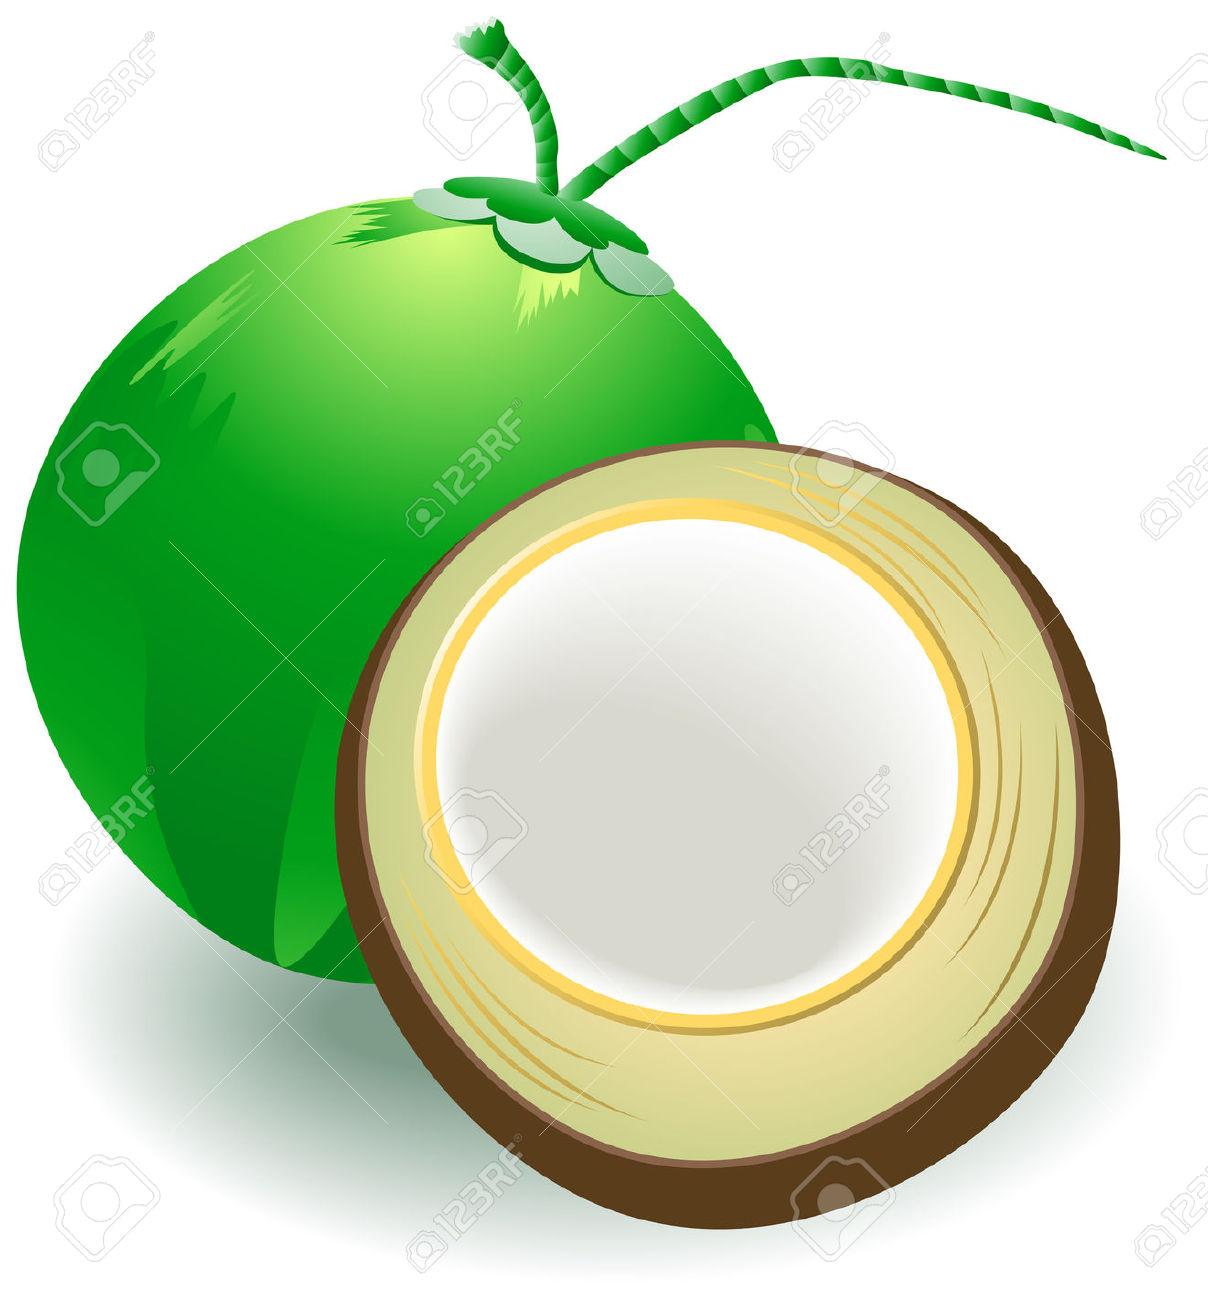 Coconut clipart.